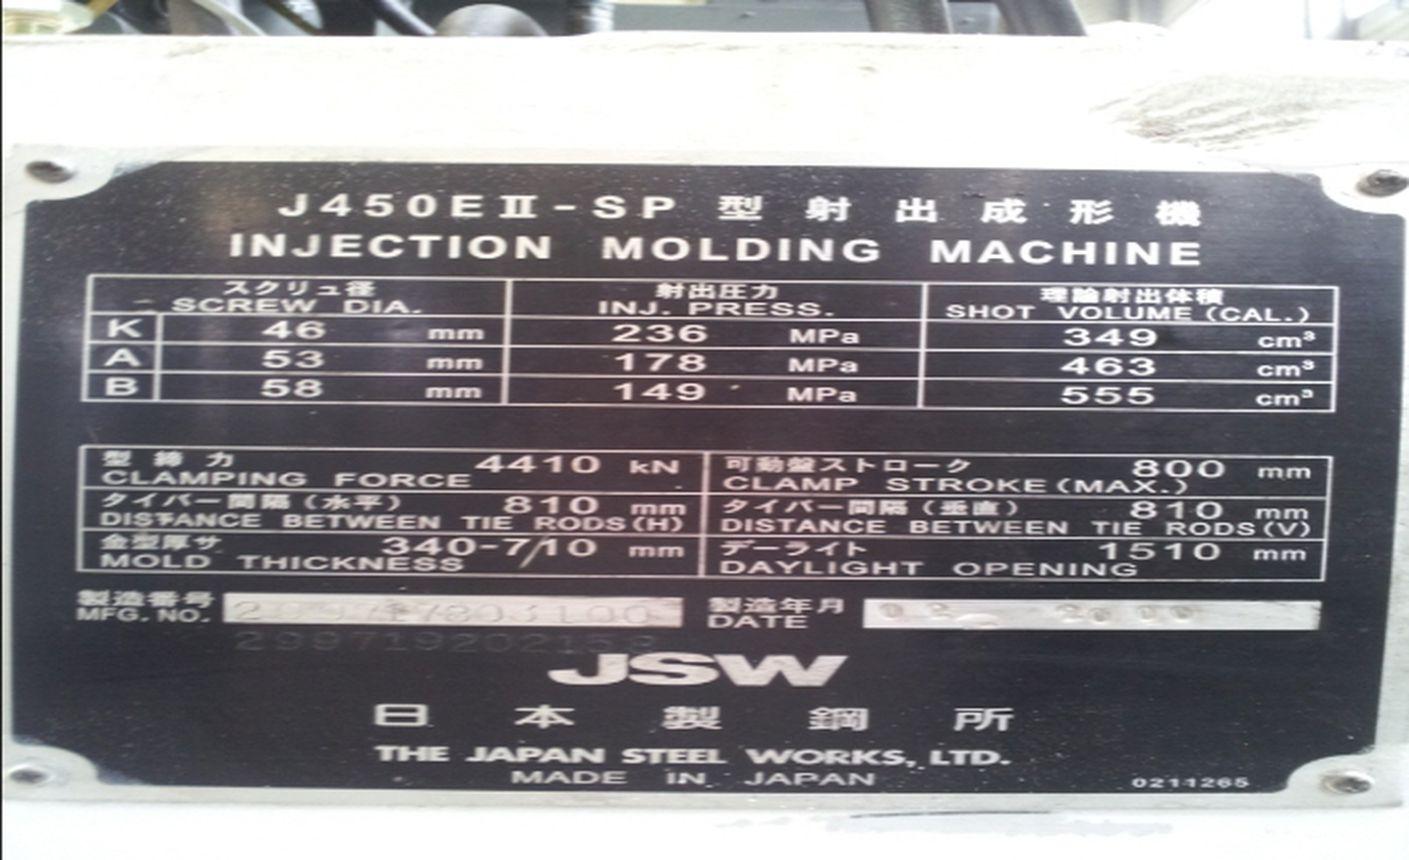 JSW Injection Molding Machine J450E II-SP J450E II-SP details